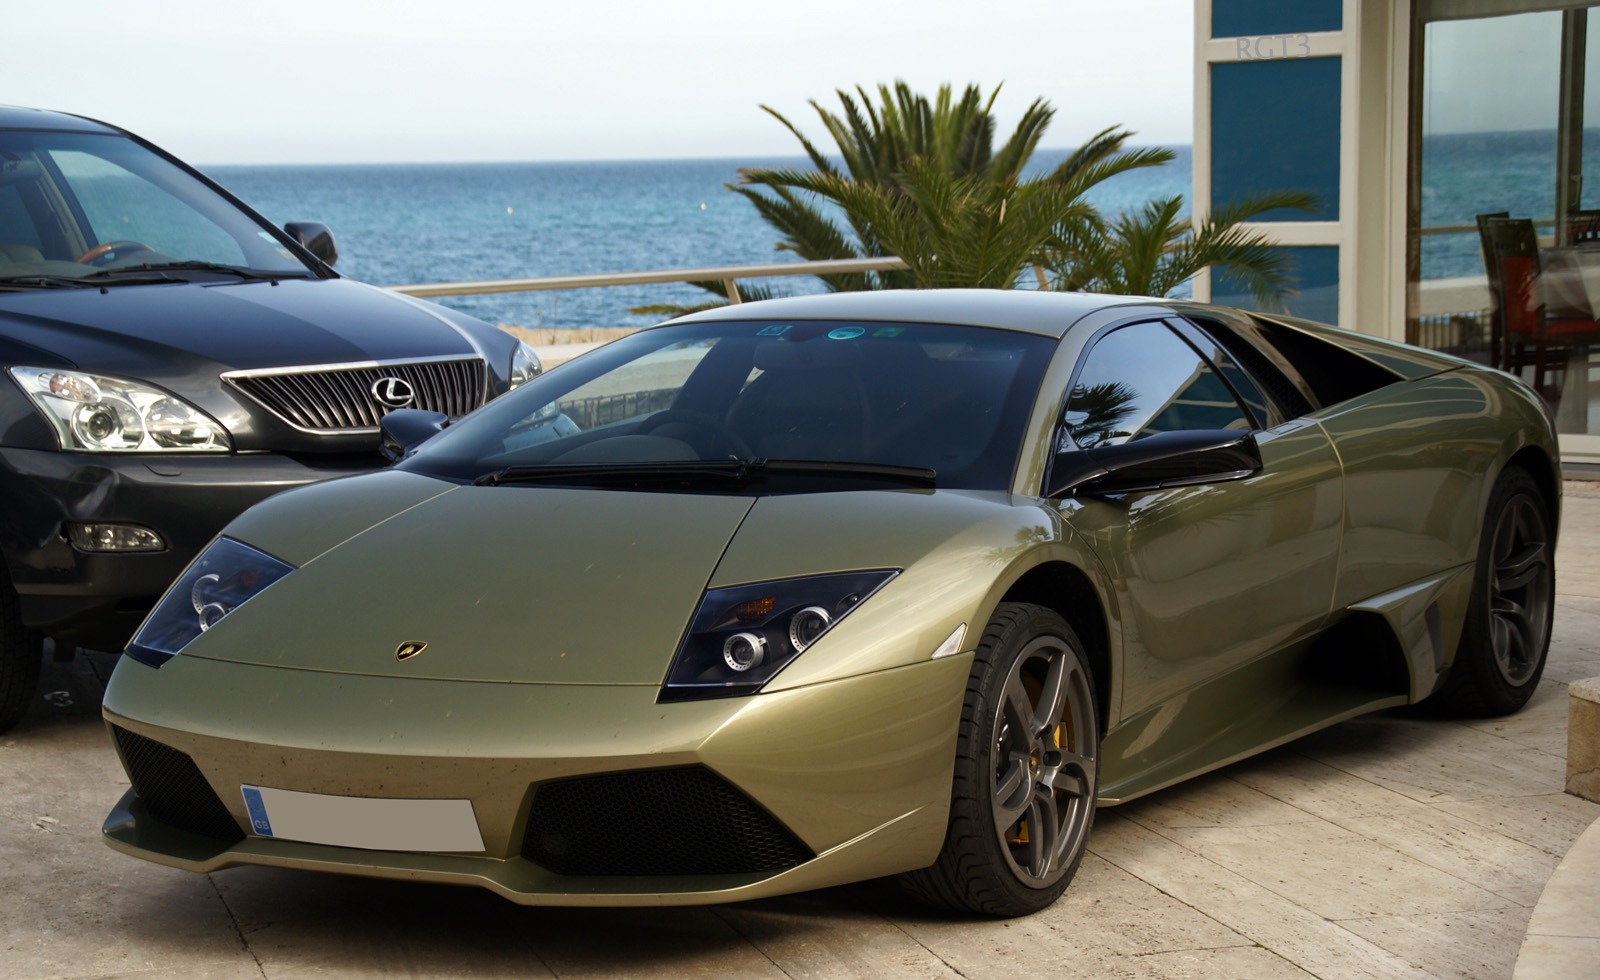 Lamborghini LP640 | Verde Draco | By: RGT3 Pics | Flickr ...